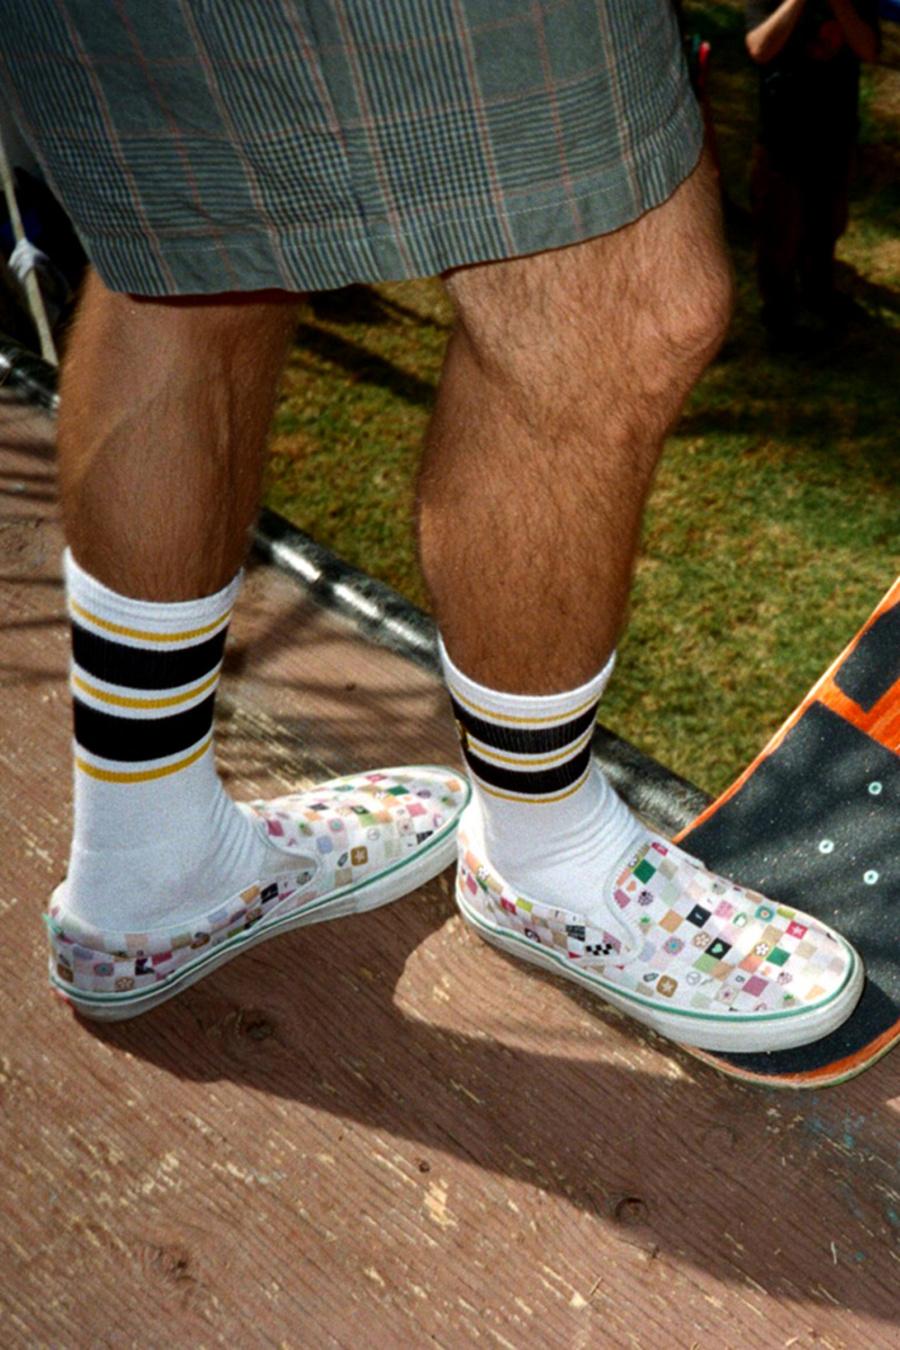 Vans,Frog Skateboards,Slip-On,  街头风十足!Frog Skateboards x Vans全新联名释出!